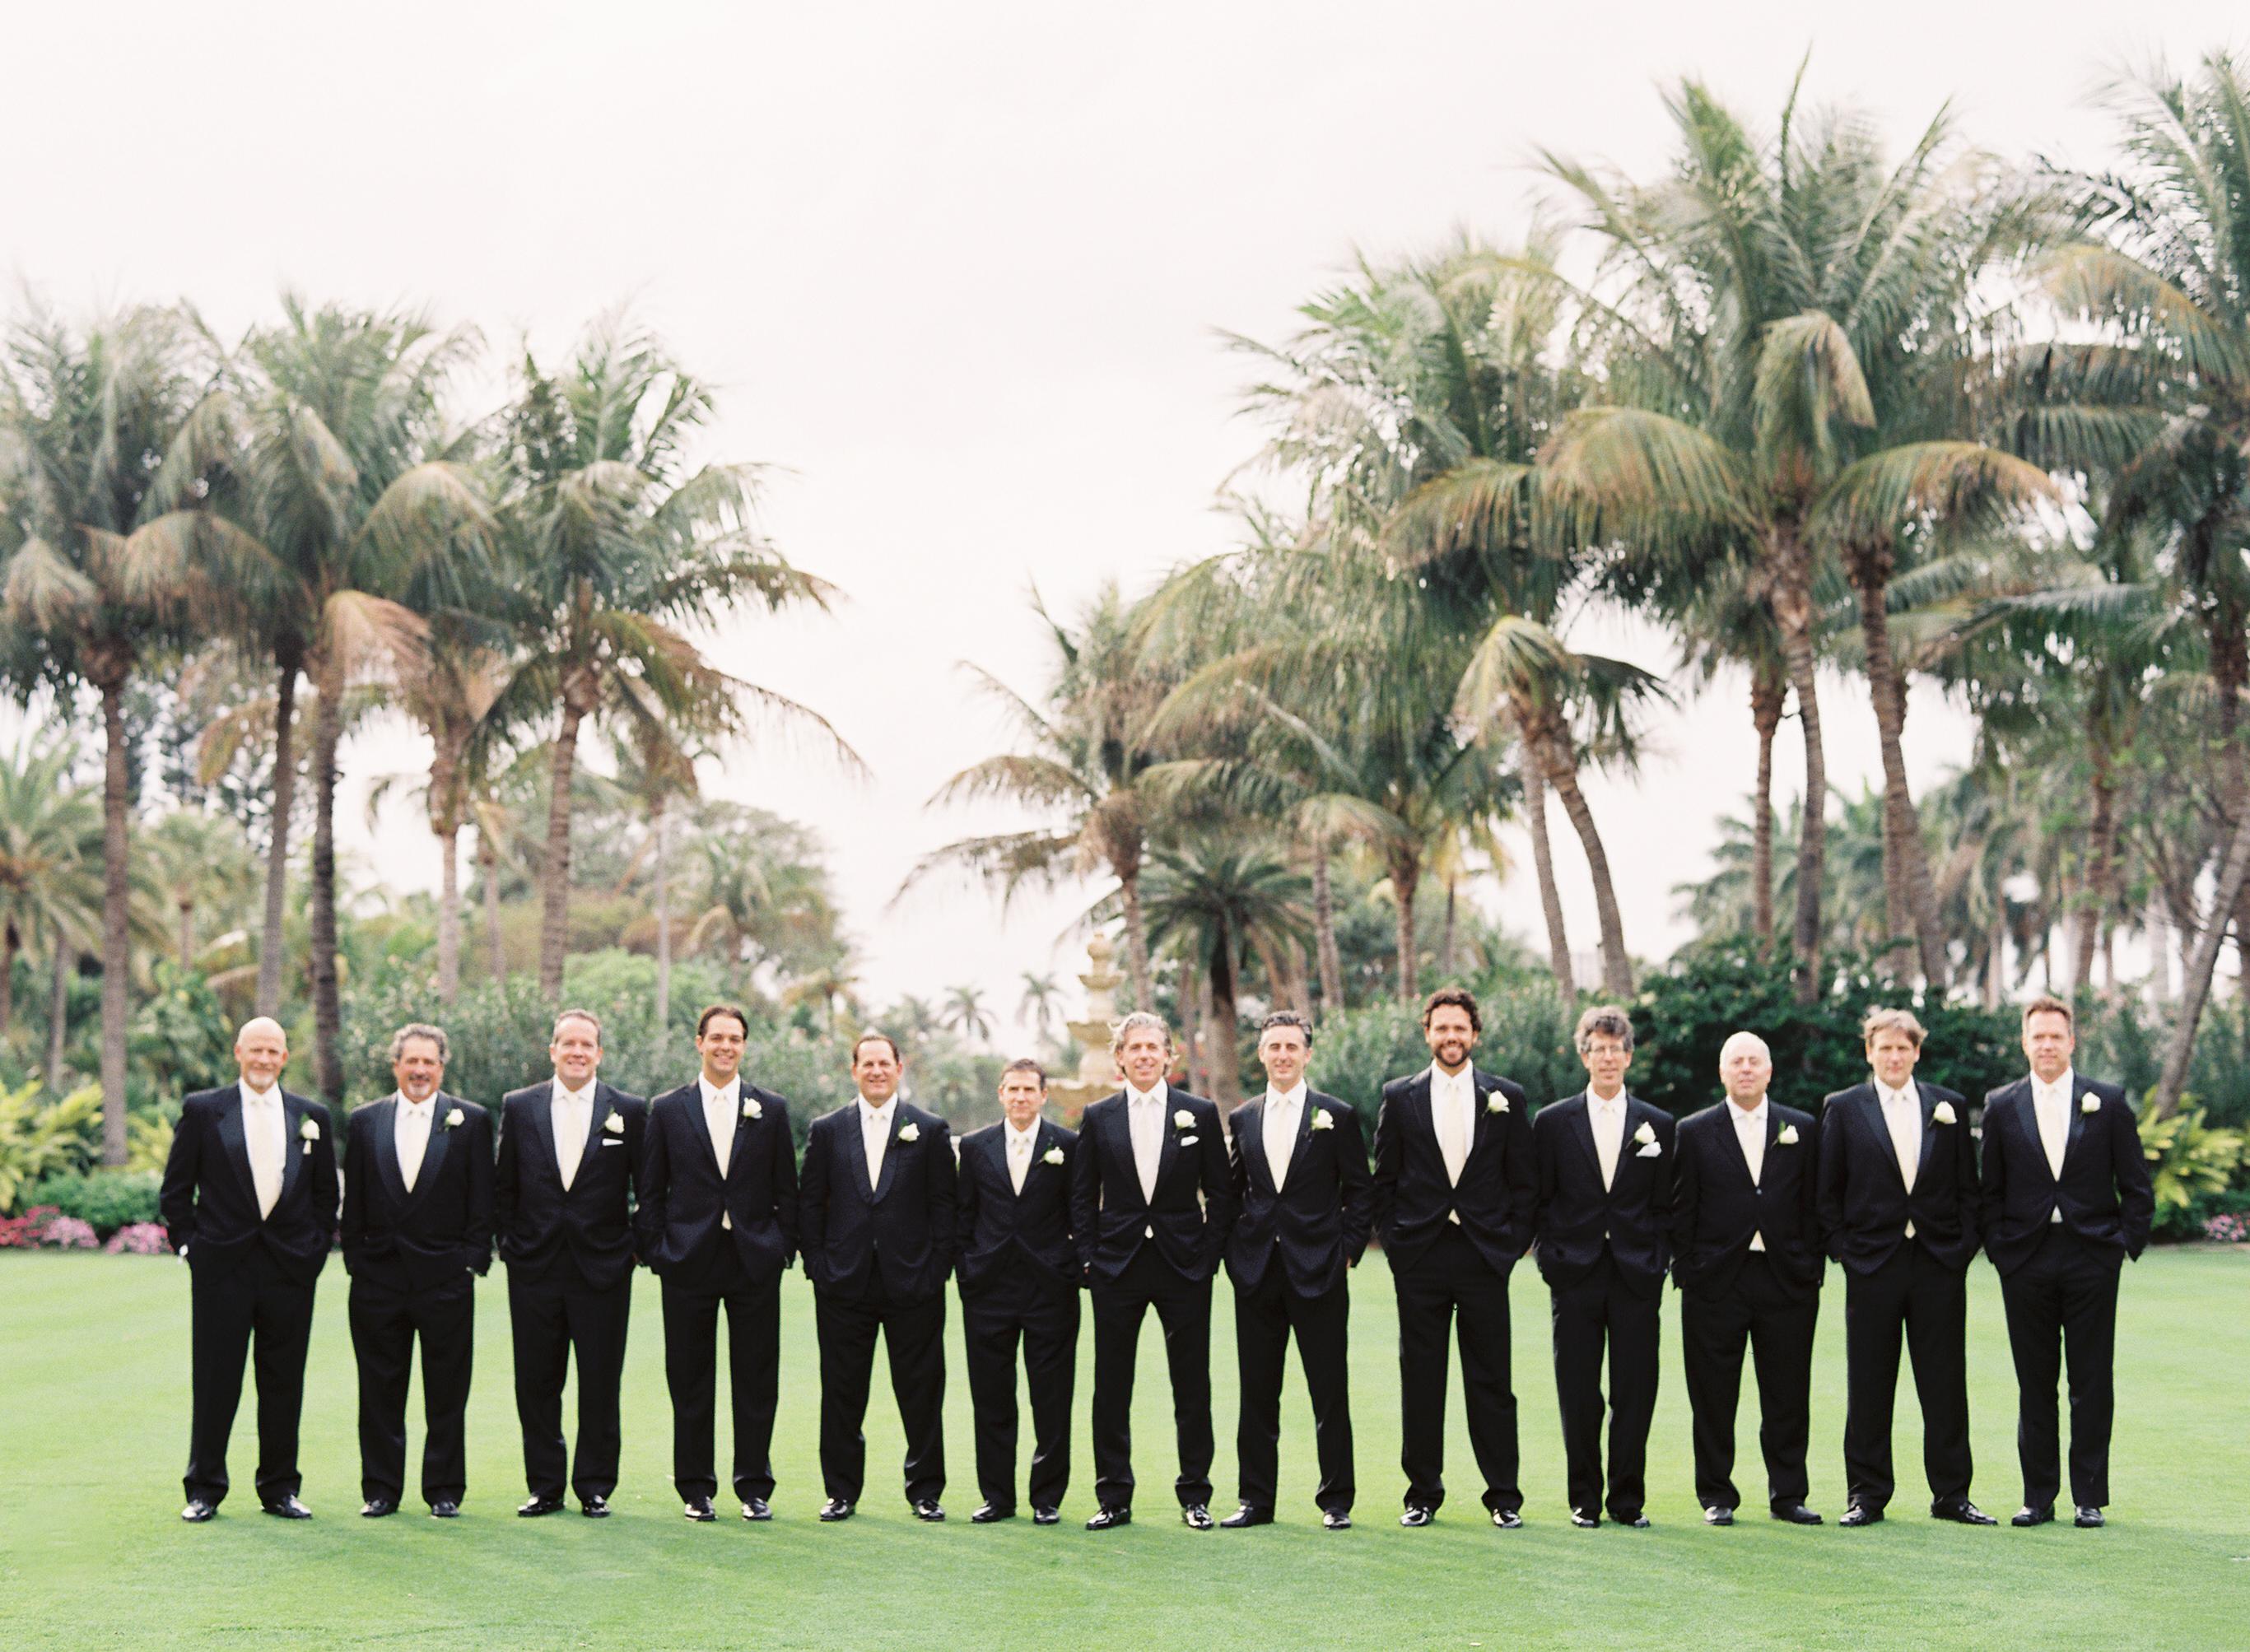 Real Weddings, Classic, Groomsmen, Southern Real Weddings, Elegant, Florida, Southern weddings, florida real weddings, florida weddings